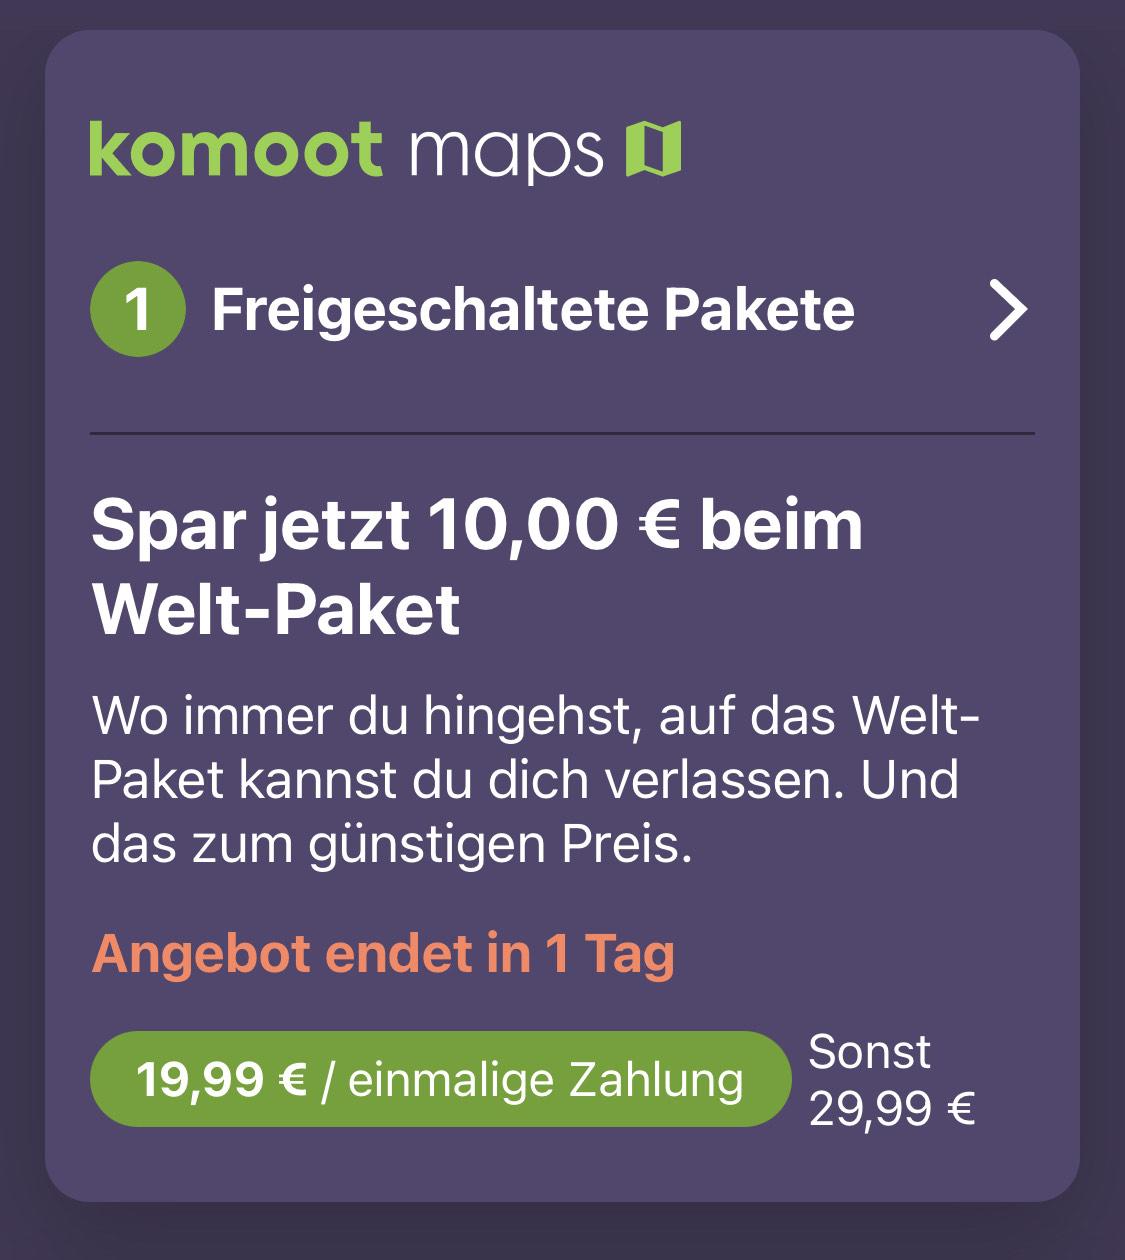 Komoot Welt-Paket 19,99 (normal 29,99) personalisiert